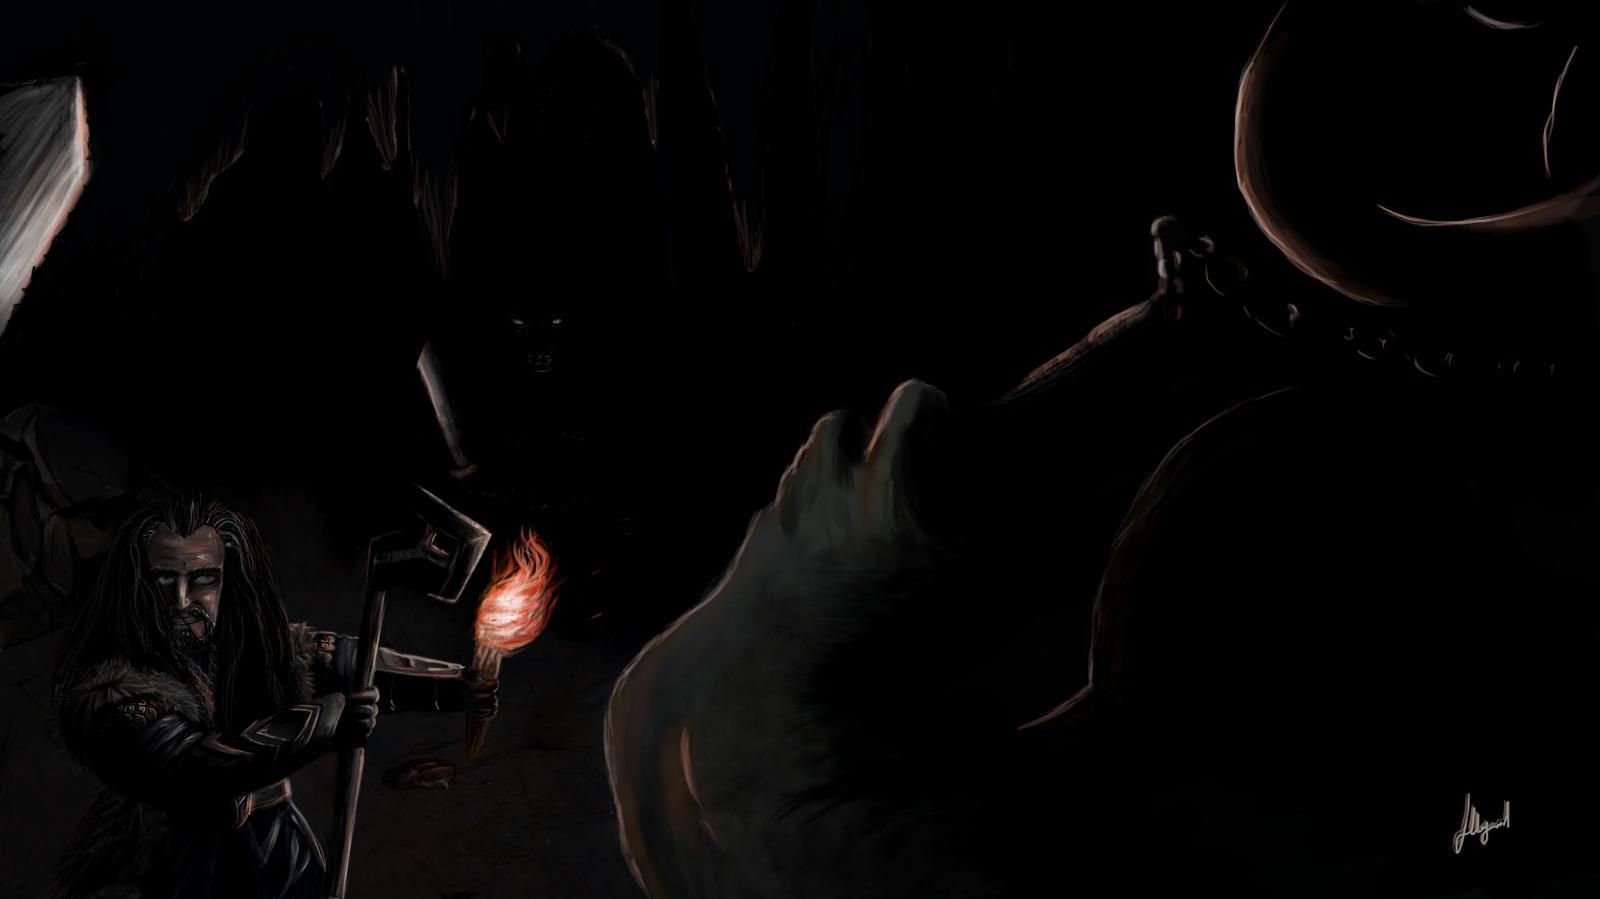 The Hobbit: Thorin Oakenshield Vs. Three Trolls by NilRecurring